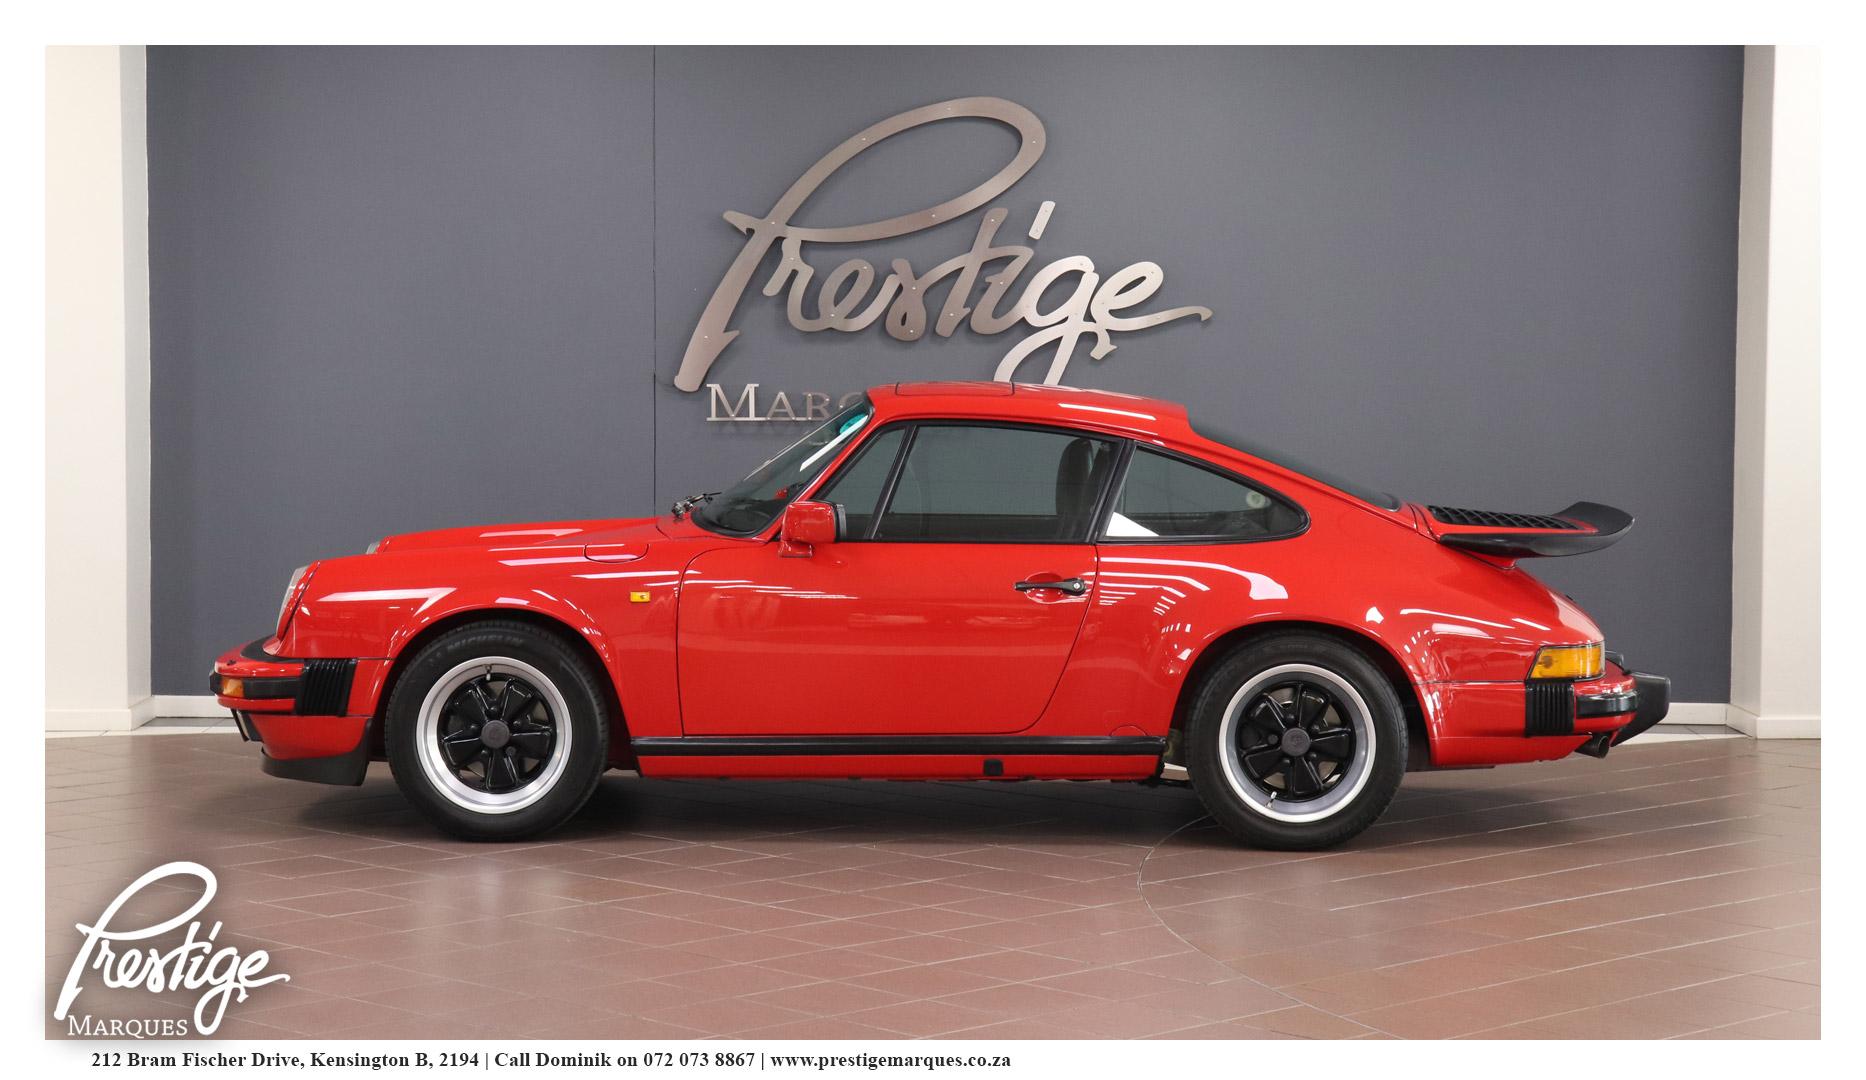 1989-Porsche-911-Carerra-3.2-350-Prestige-Marques-Randburg-Sandton-7